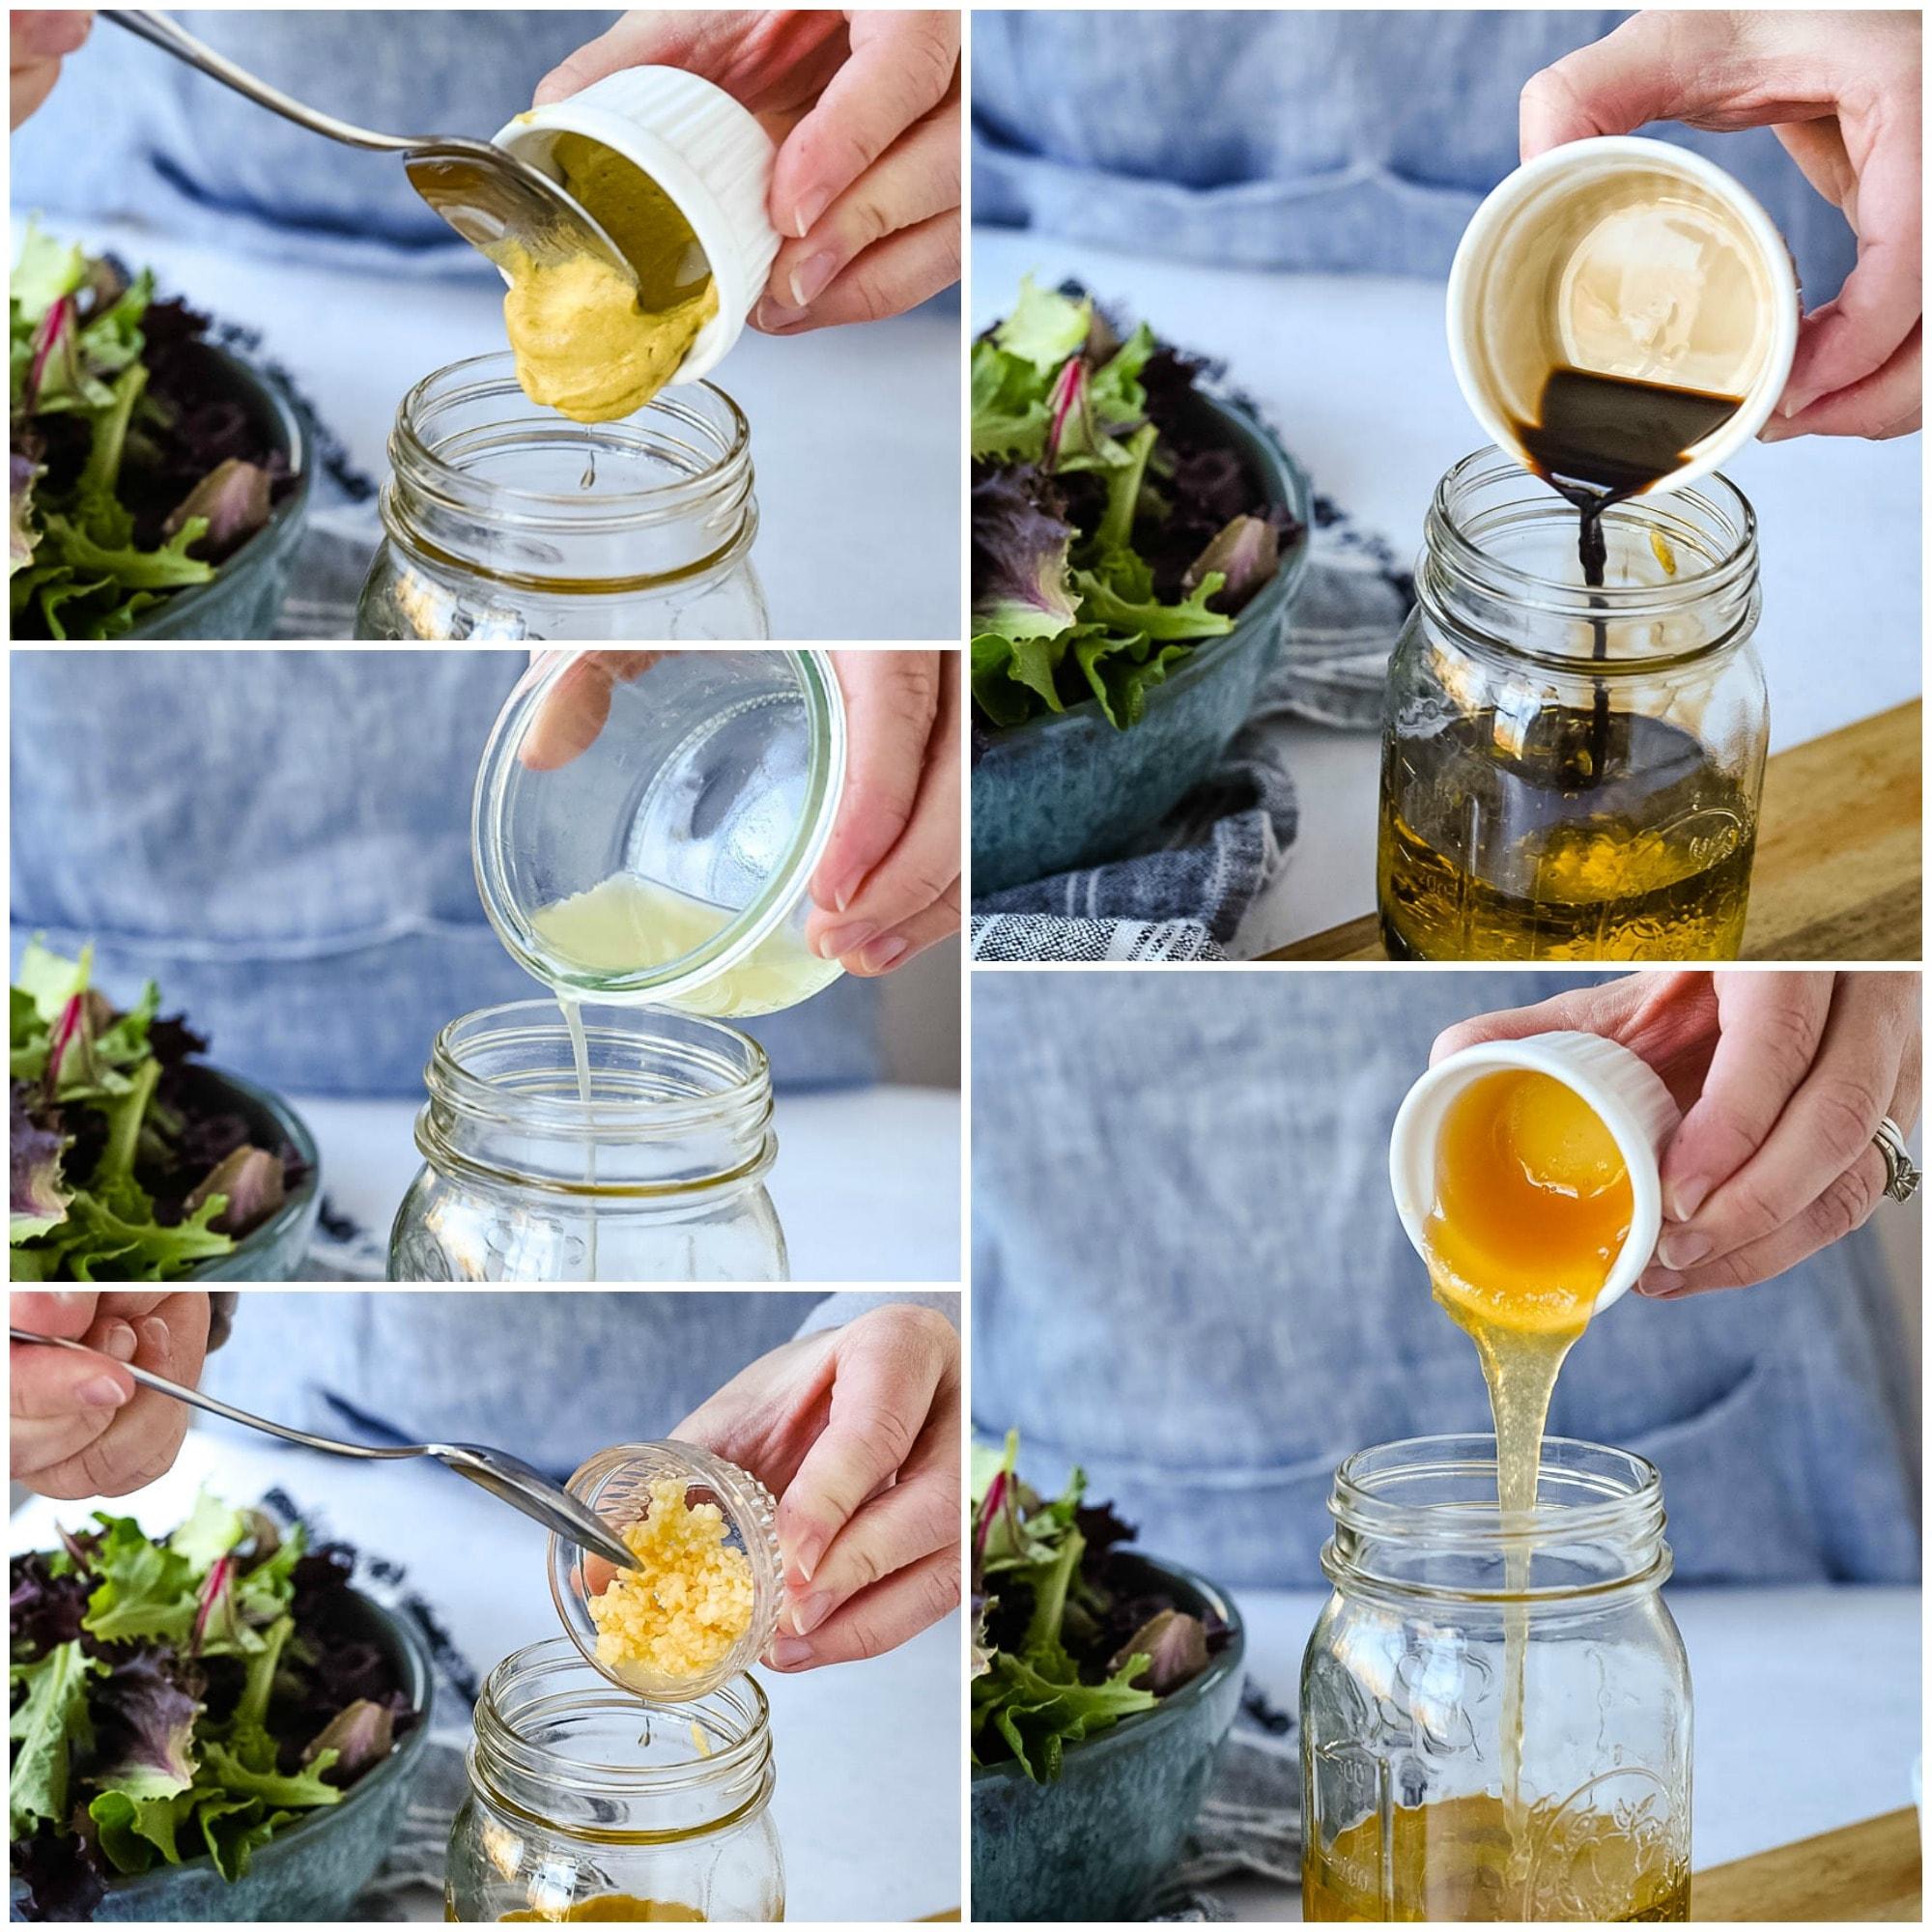 collage of vinaigrette ingredients